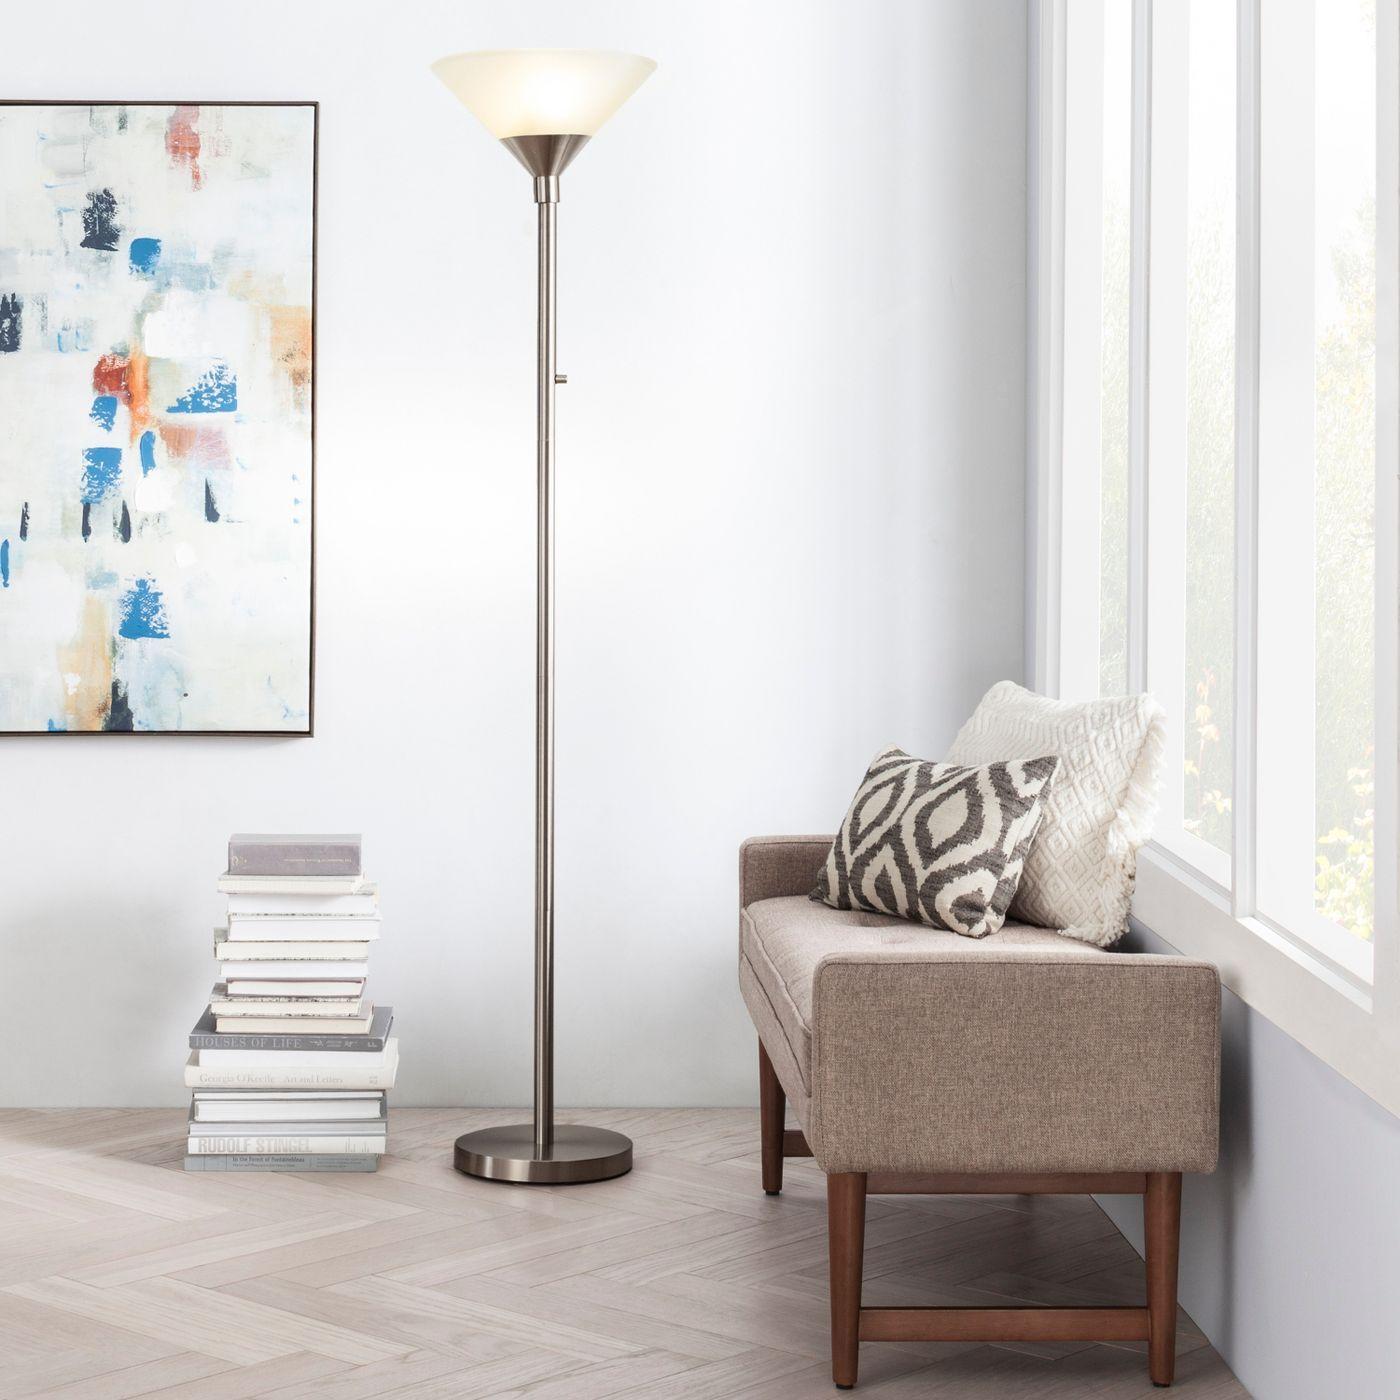 Torch Floor Lamp Threshold in 2020 Overarching floor